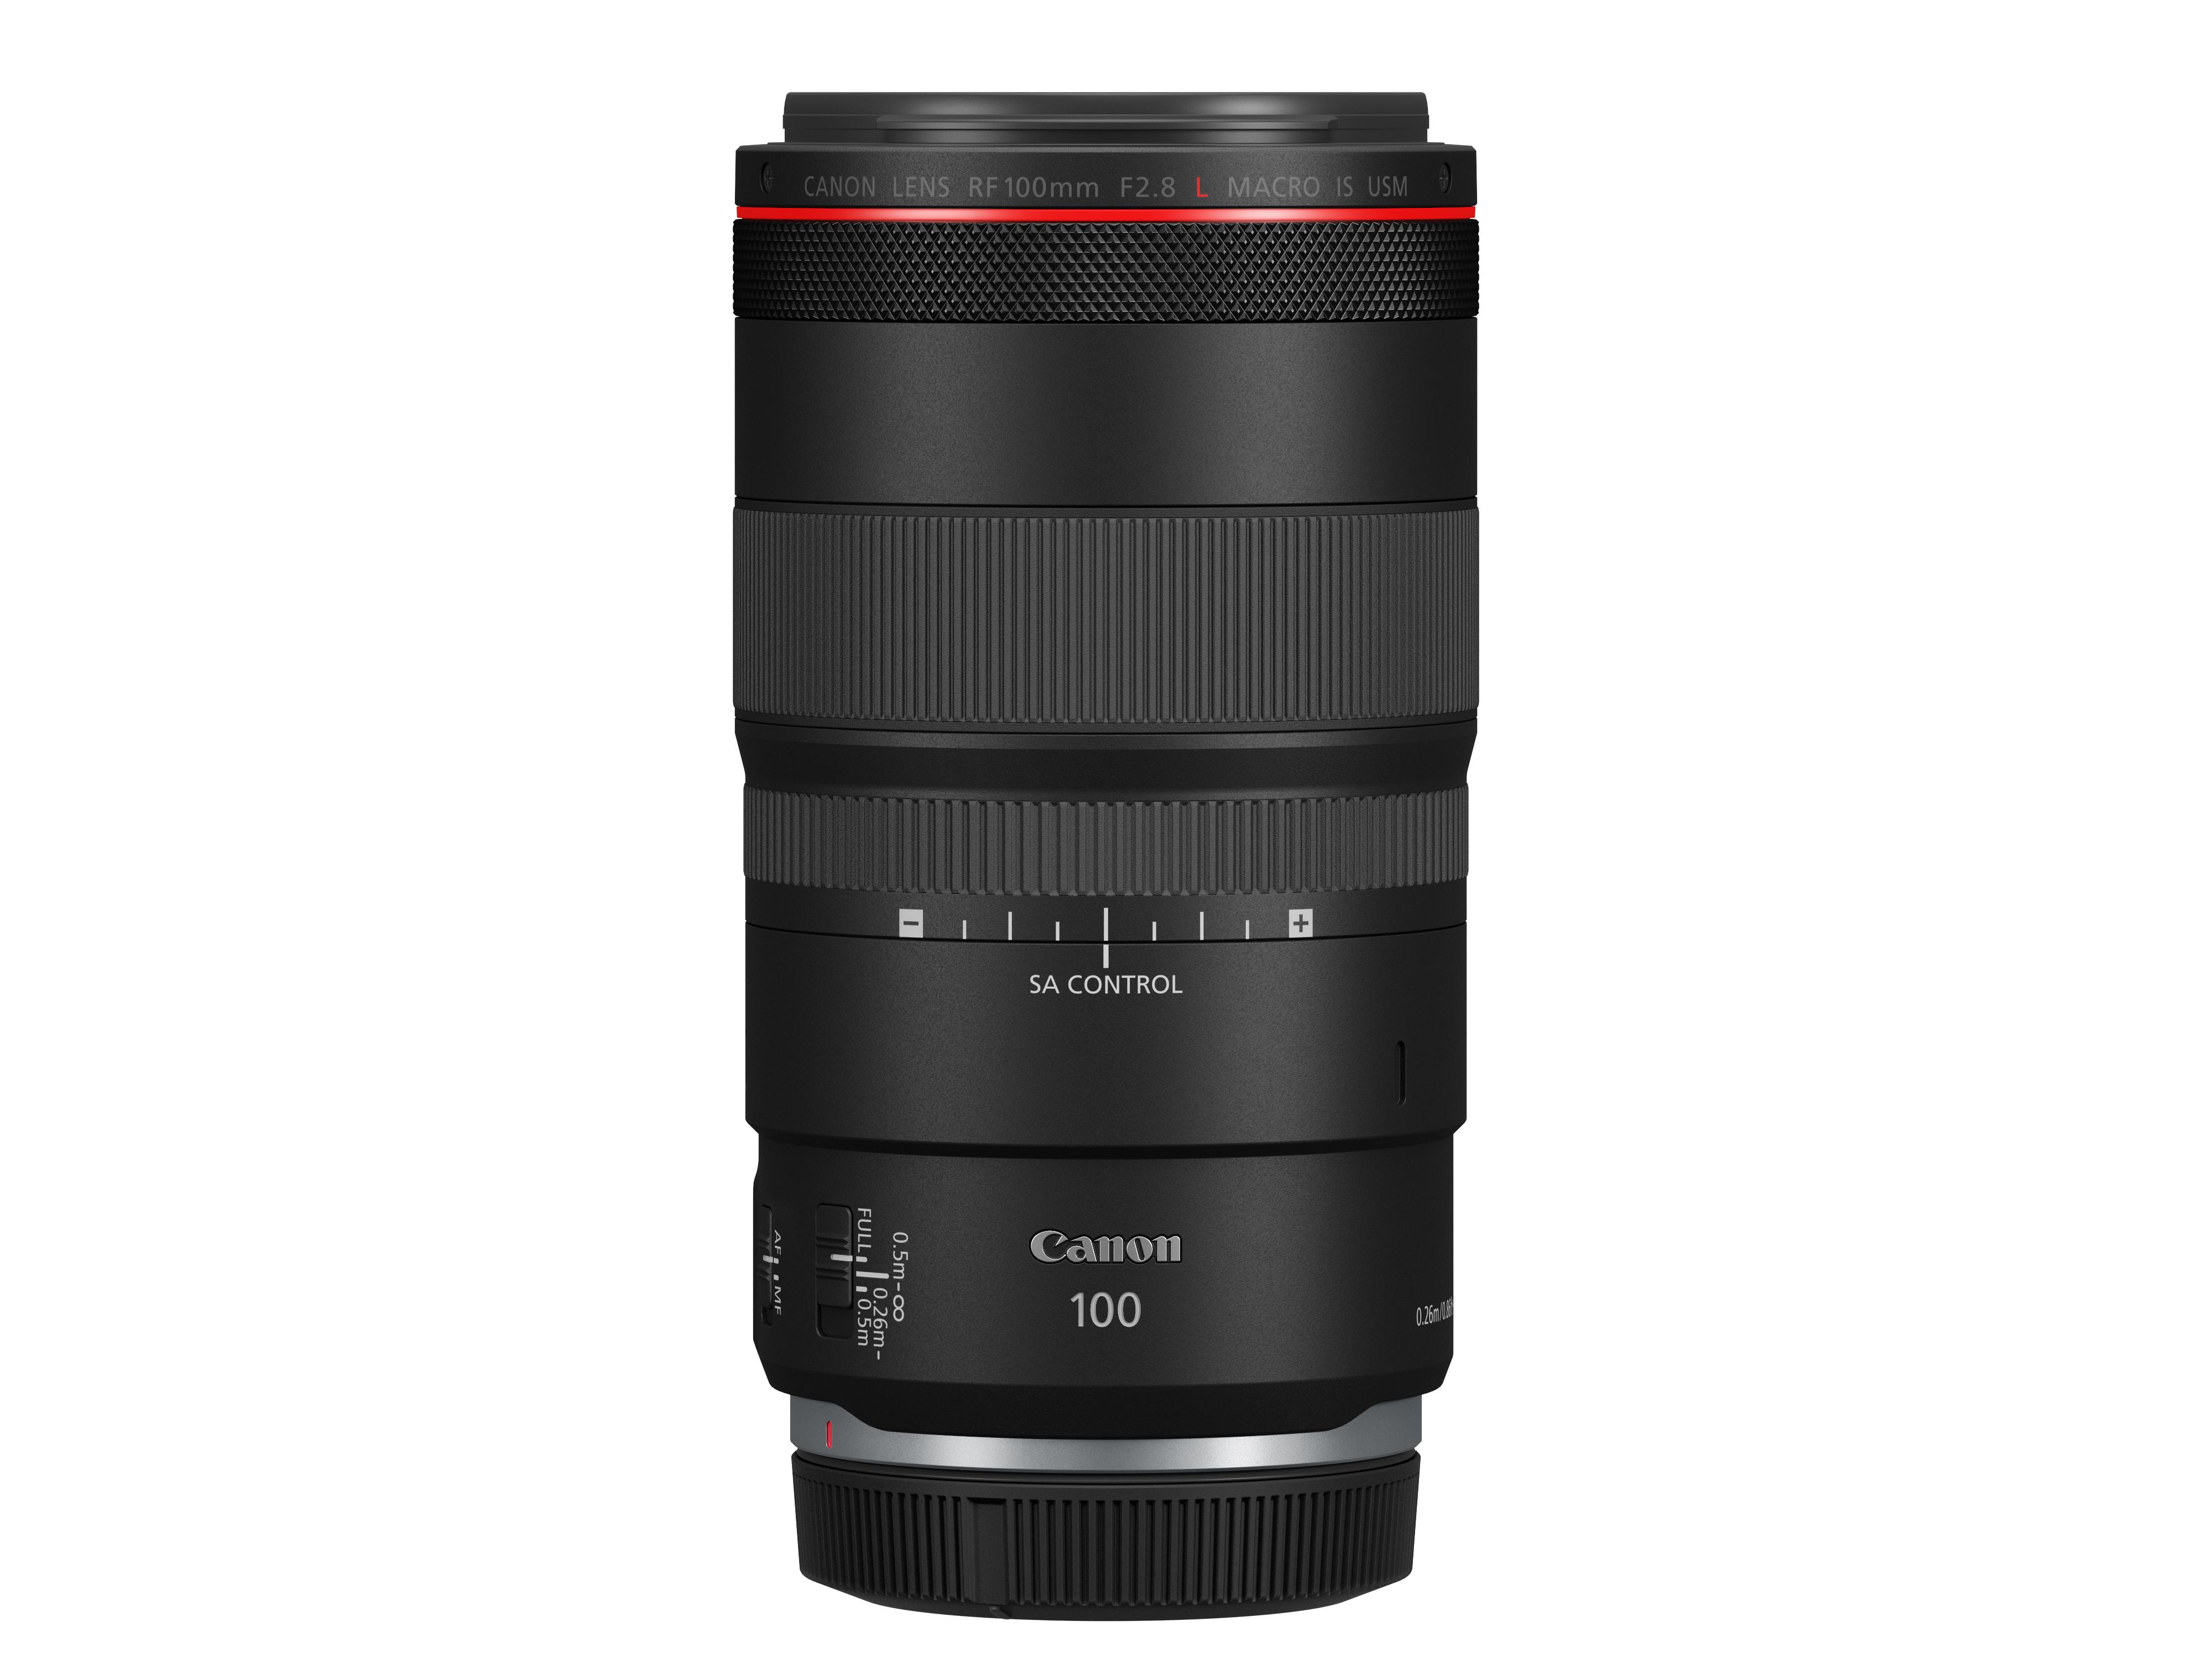 Canon RF 100mm f/2.8L Macro IS STM lens